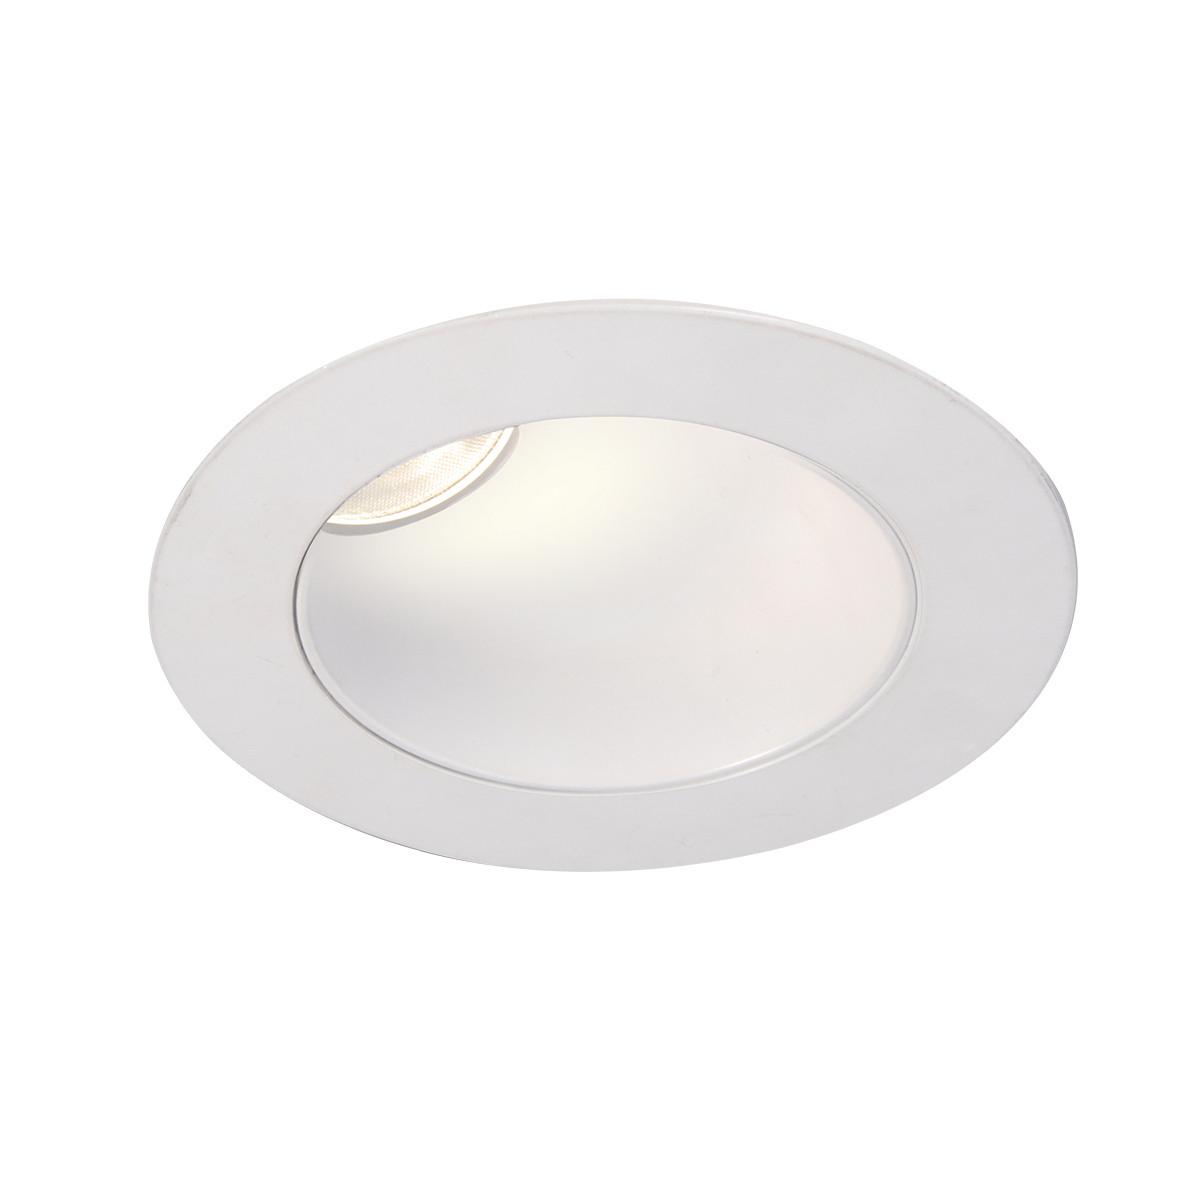 *NEW* Juno Lighting 264W-WH 6-Inch Recessed Trim Adj Tapered White Baffle//Trim